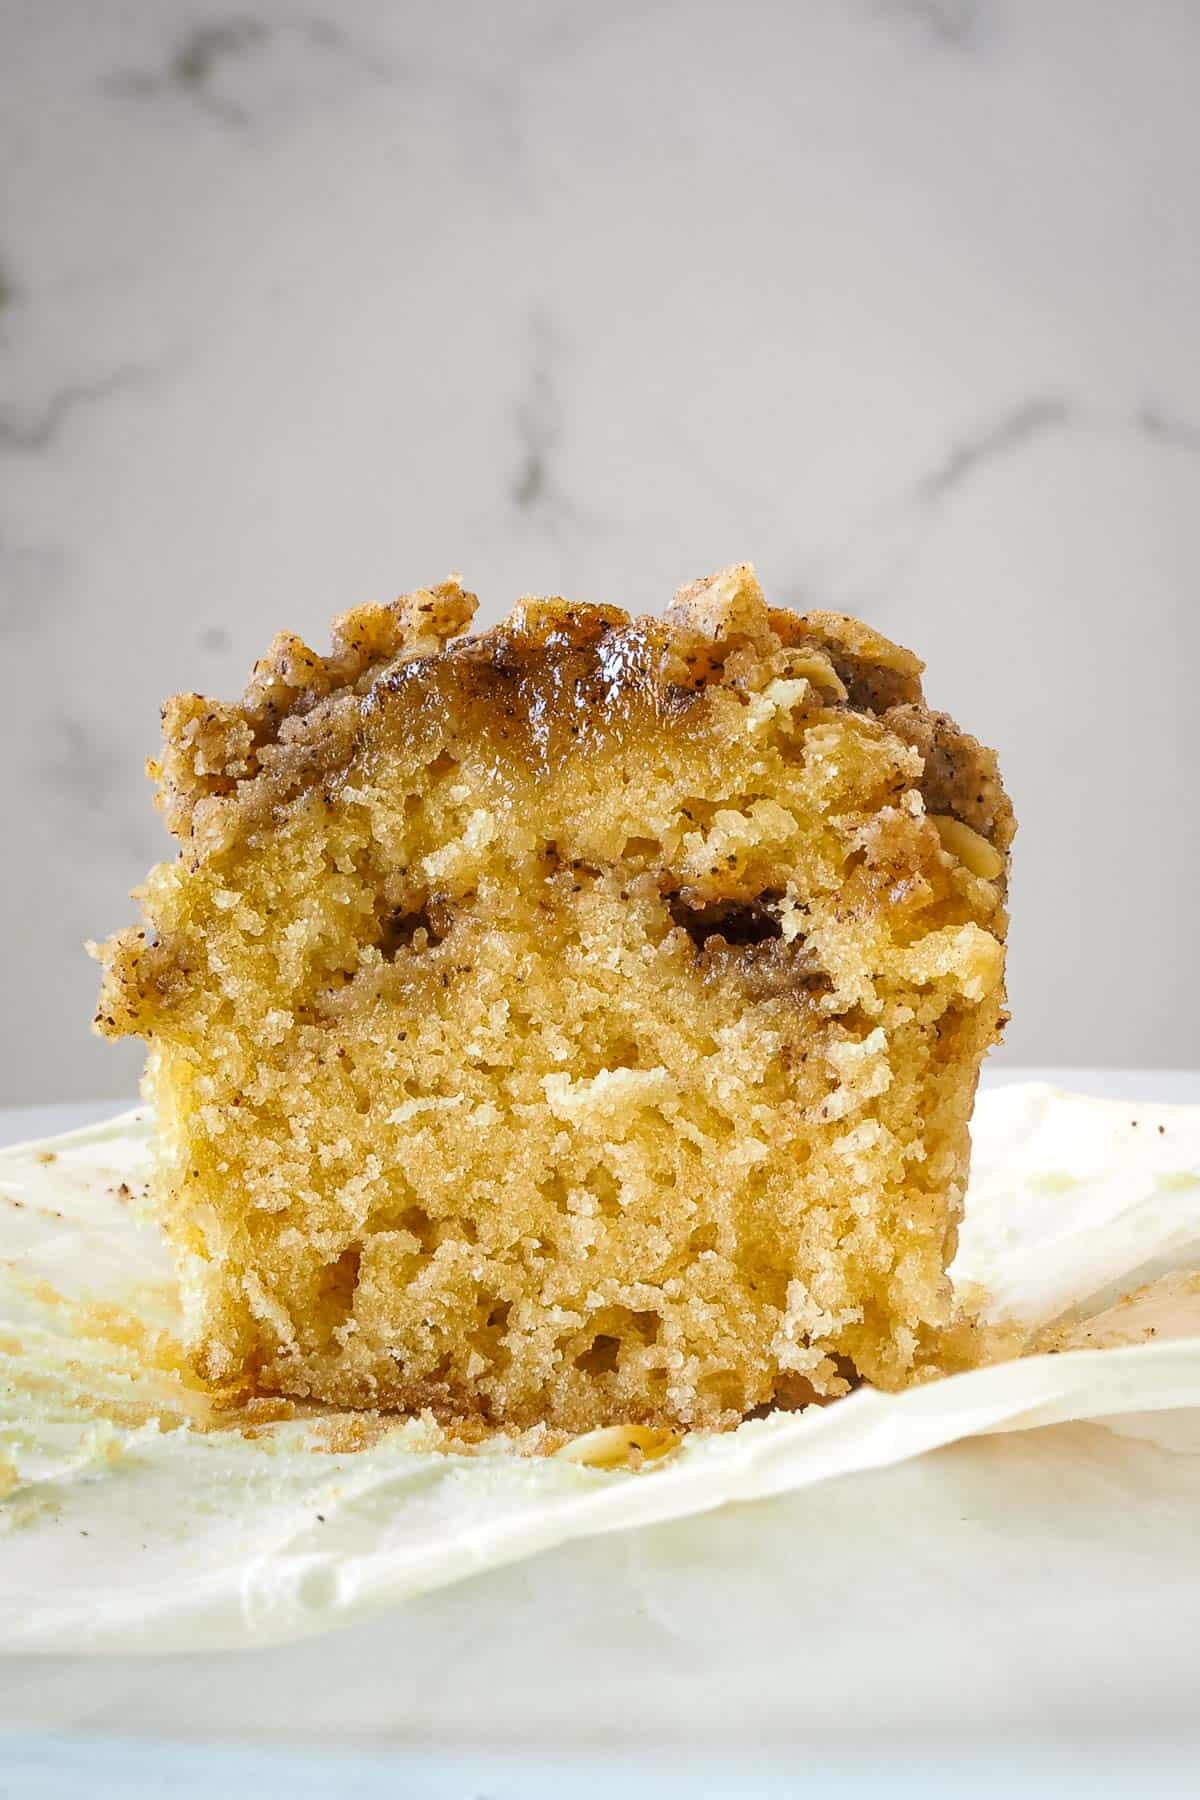 A muffin cut into half